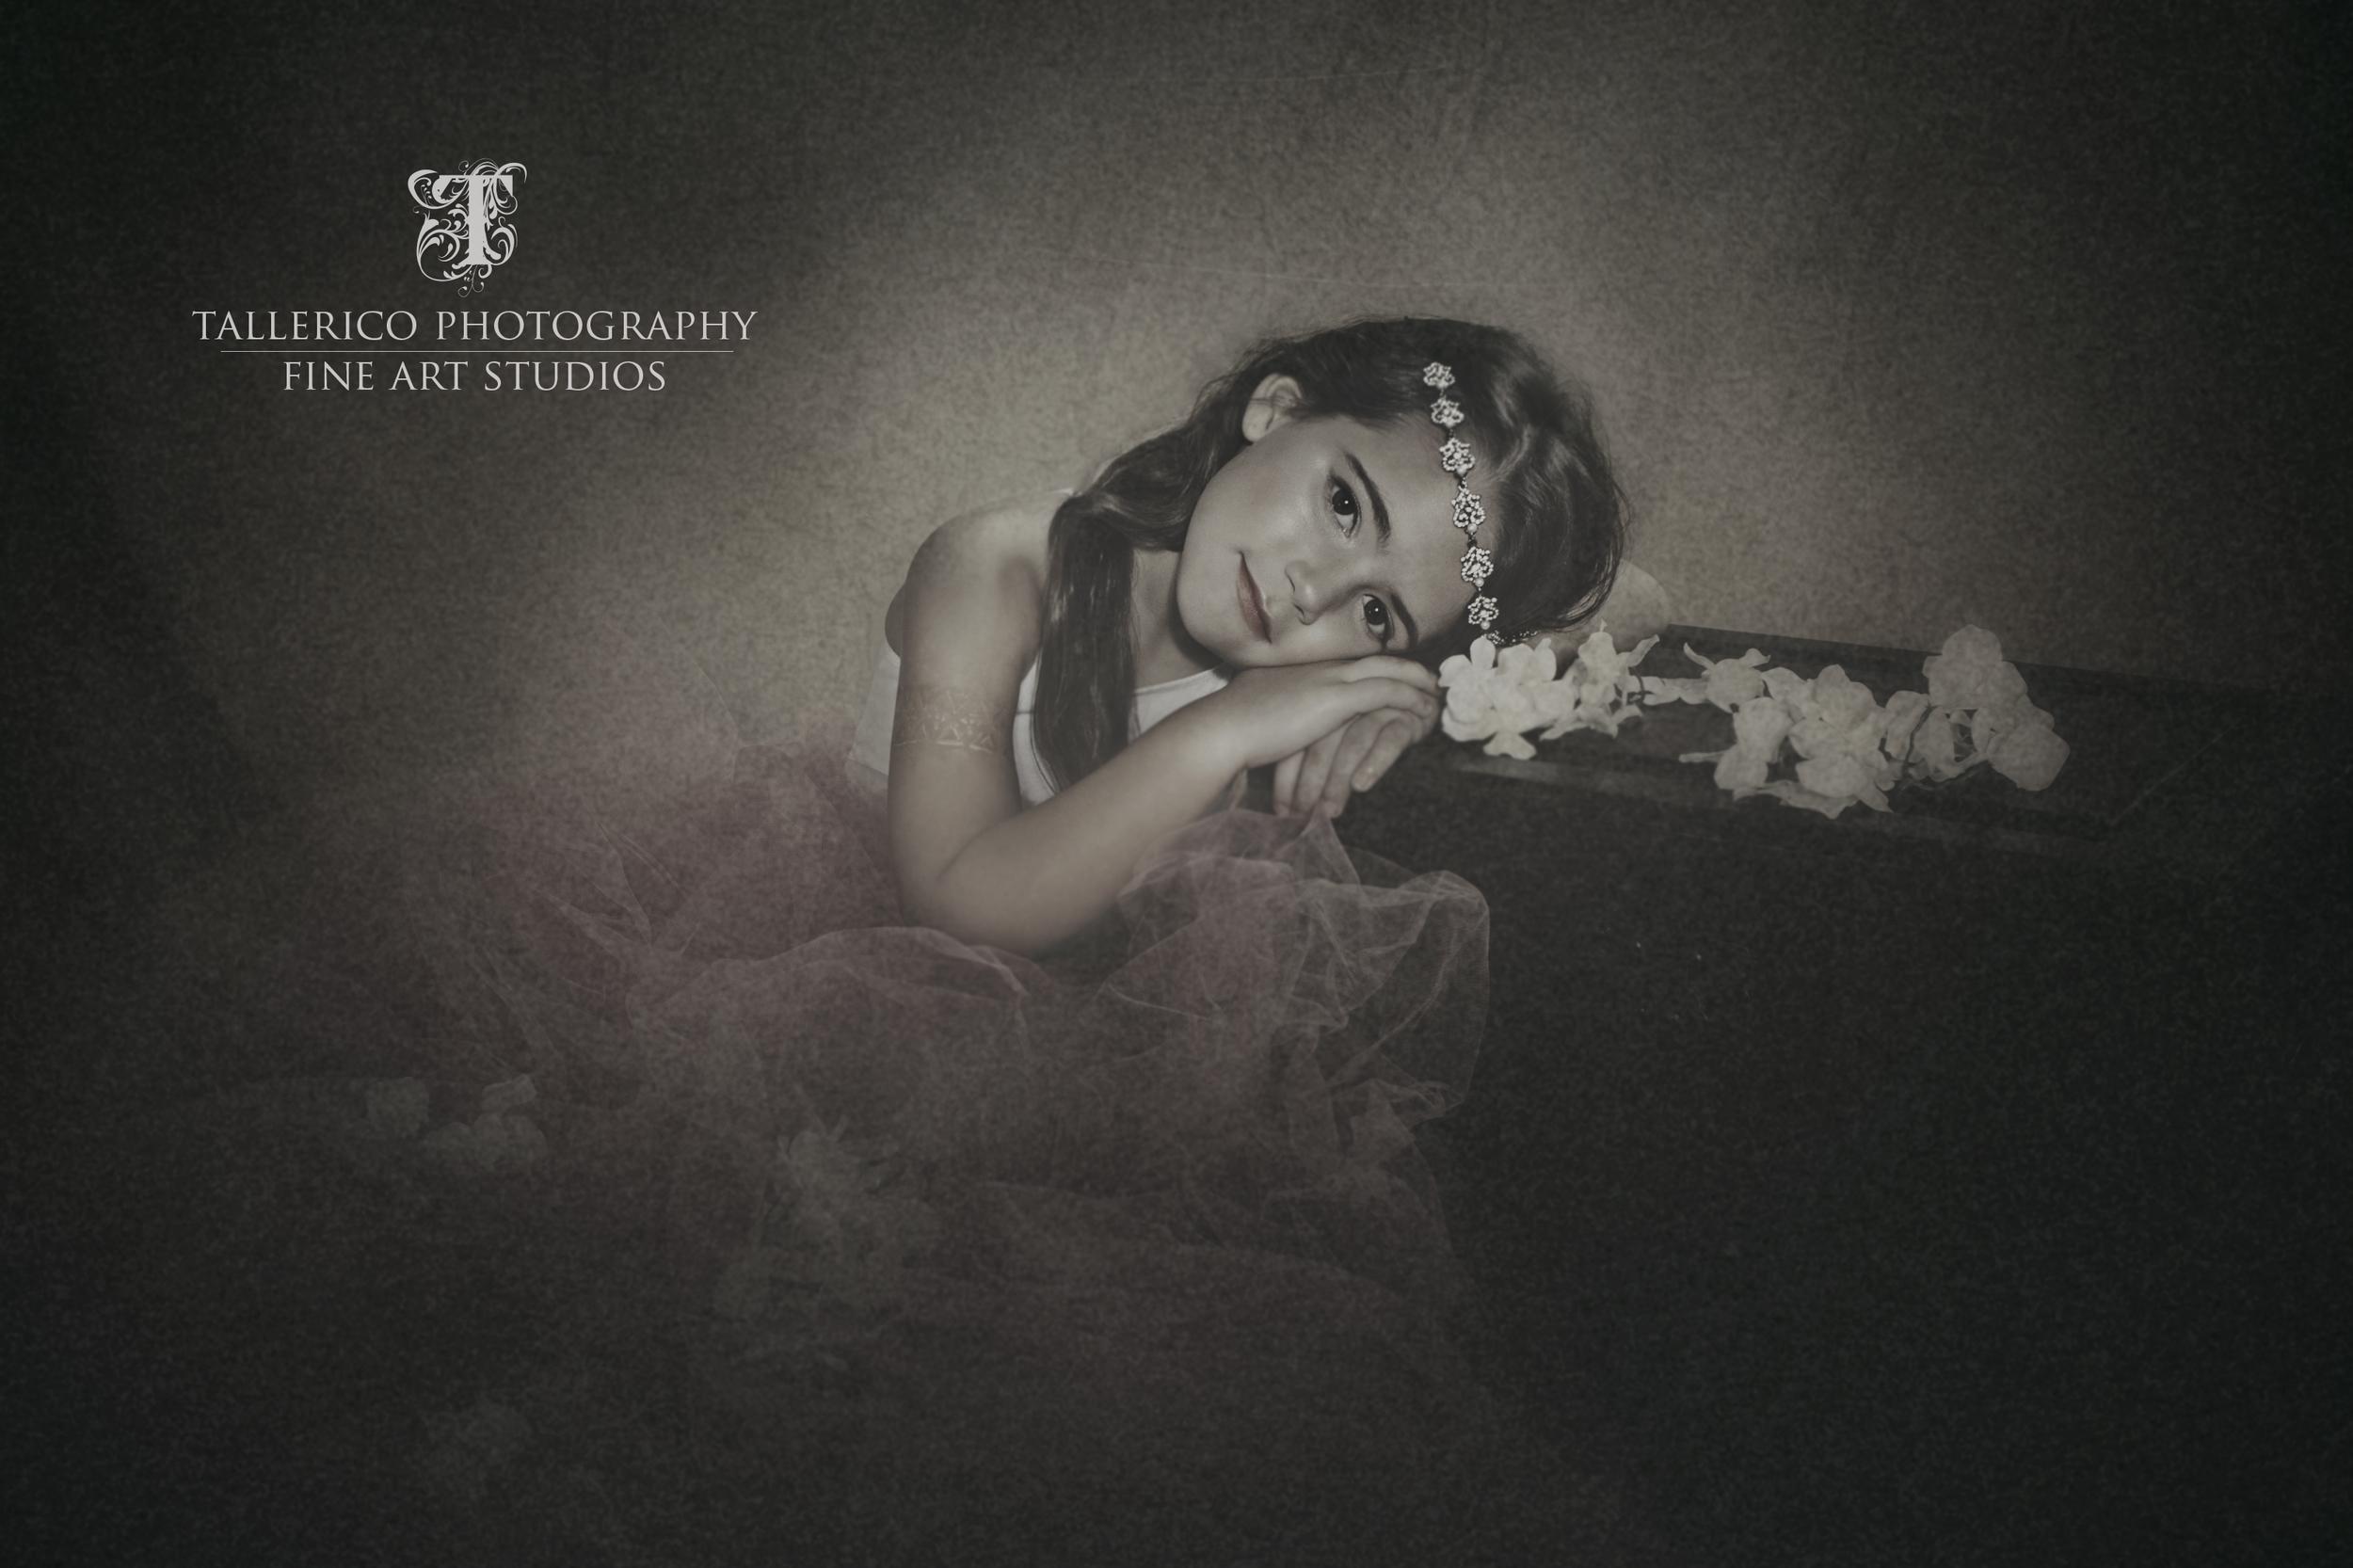 Tallerico_Photography_Childrensfineartphotographer_Sloan_11_2014.jpg